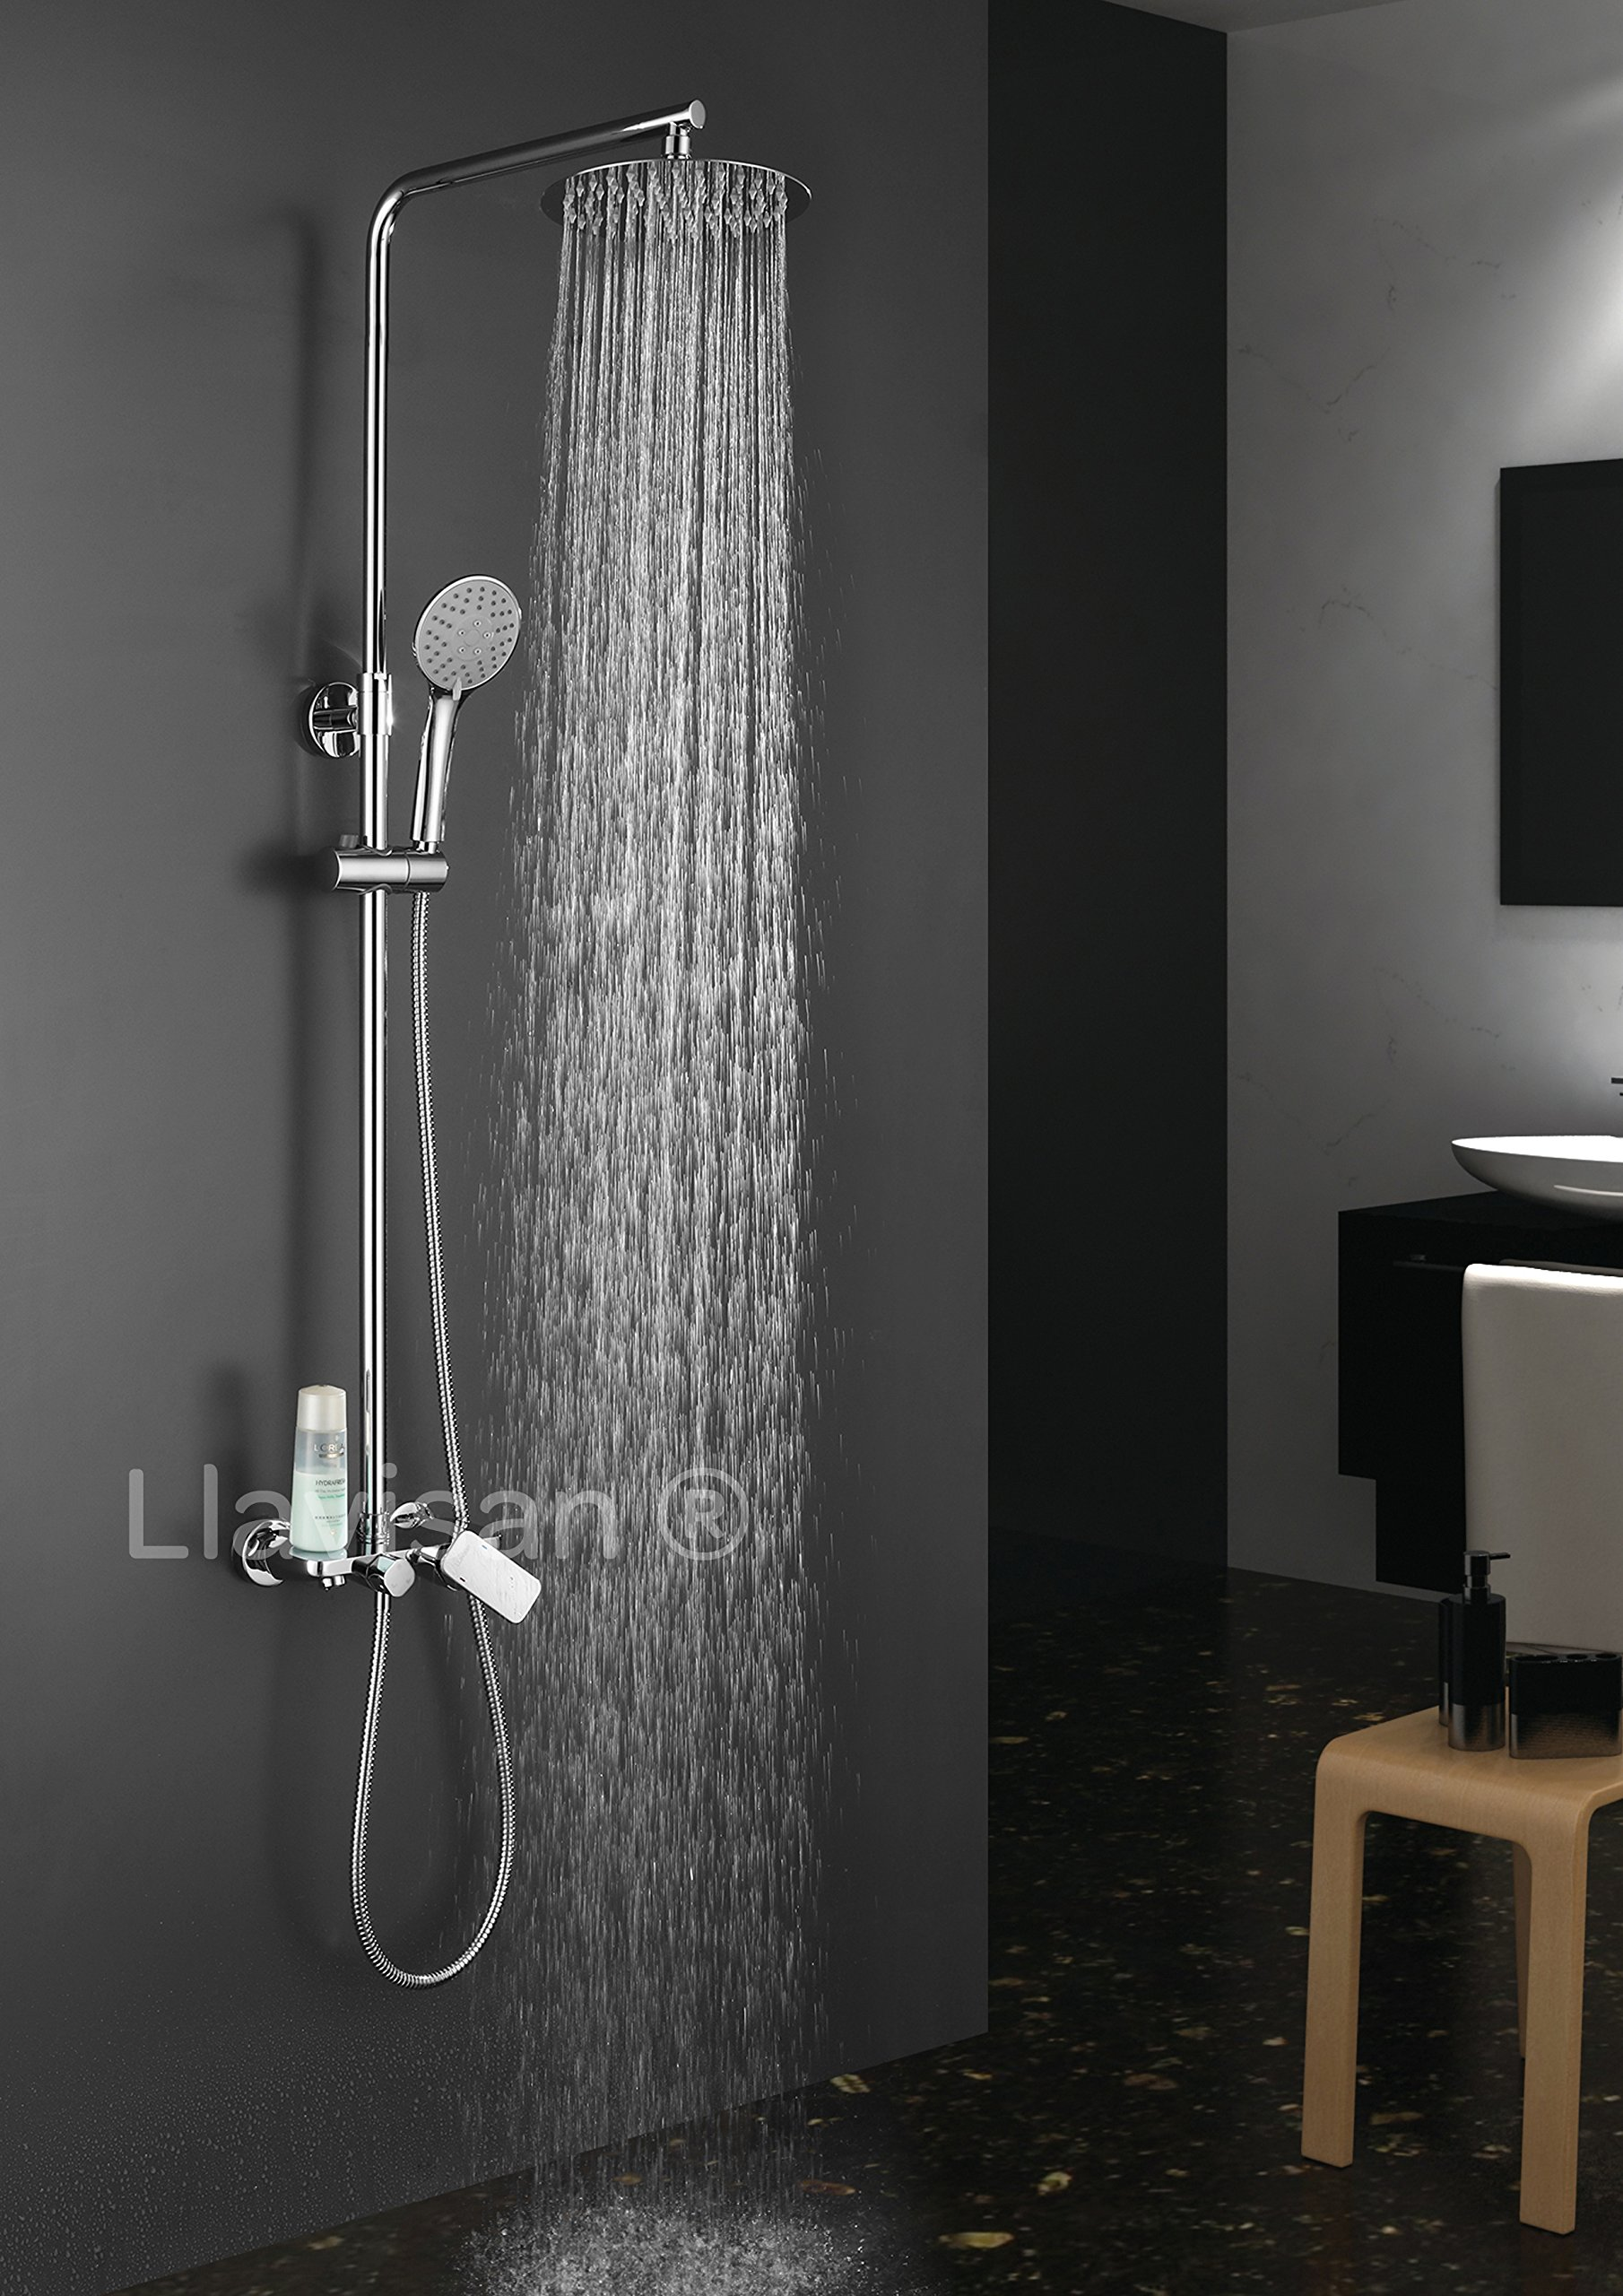 Conjunto de ducha monomando dual ROUND. 3 vías de salida: maneral REDONDO, rociador REDONDO y grifo de bañera. Incluye columna de ducha con tubo regulable.